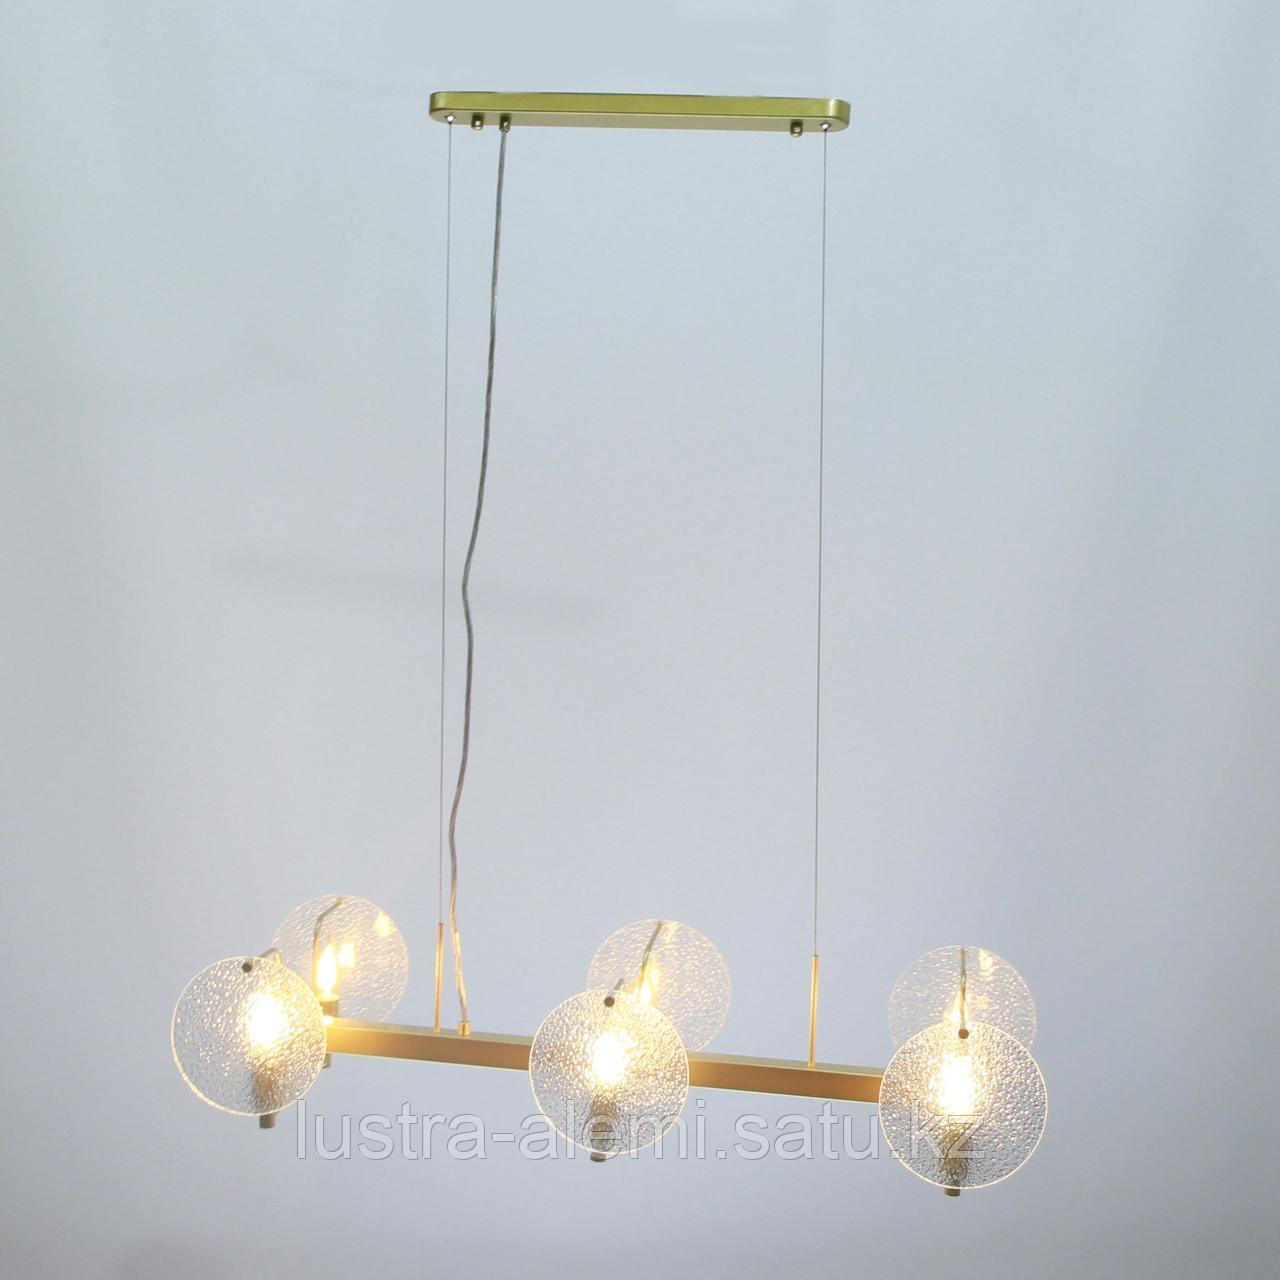 Люстра Hi-Tech LSN 5123/6 S-R Light Gold E14*6 H=860*344*204